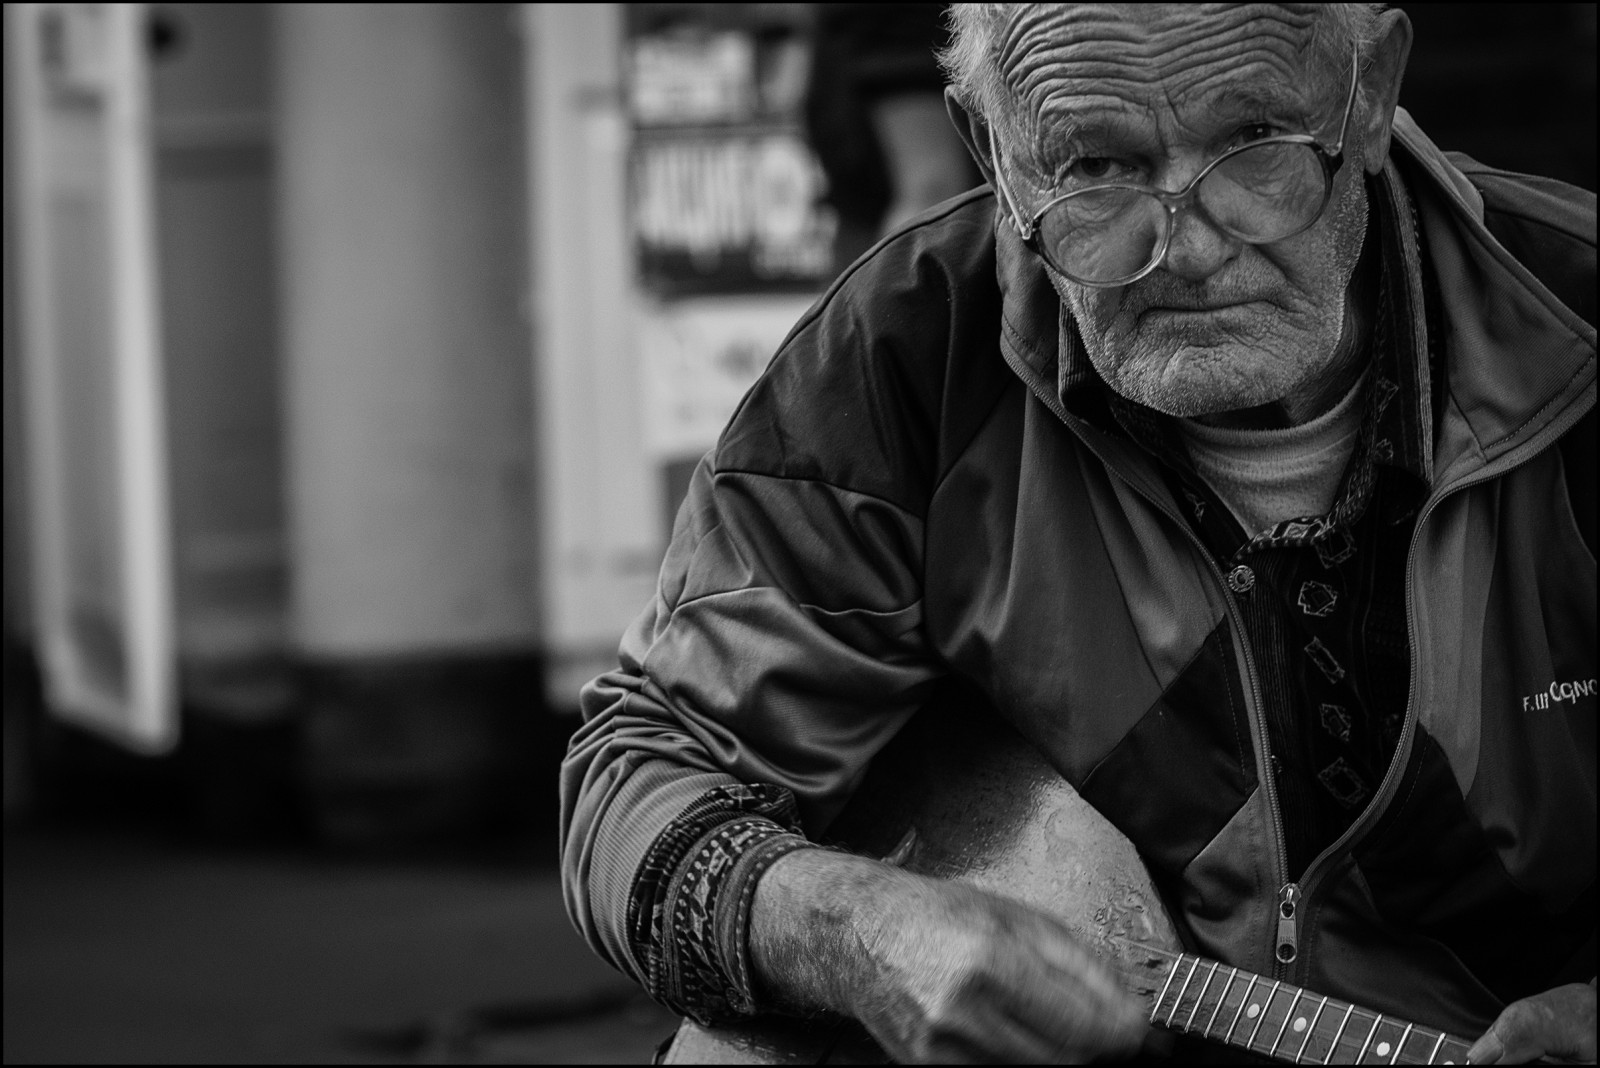 https://c.wallhere.com/photos/76/e2/player_oldman_people_city_street_photo_balalaika_man-664007.jpg!d